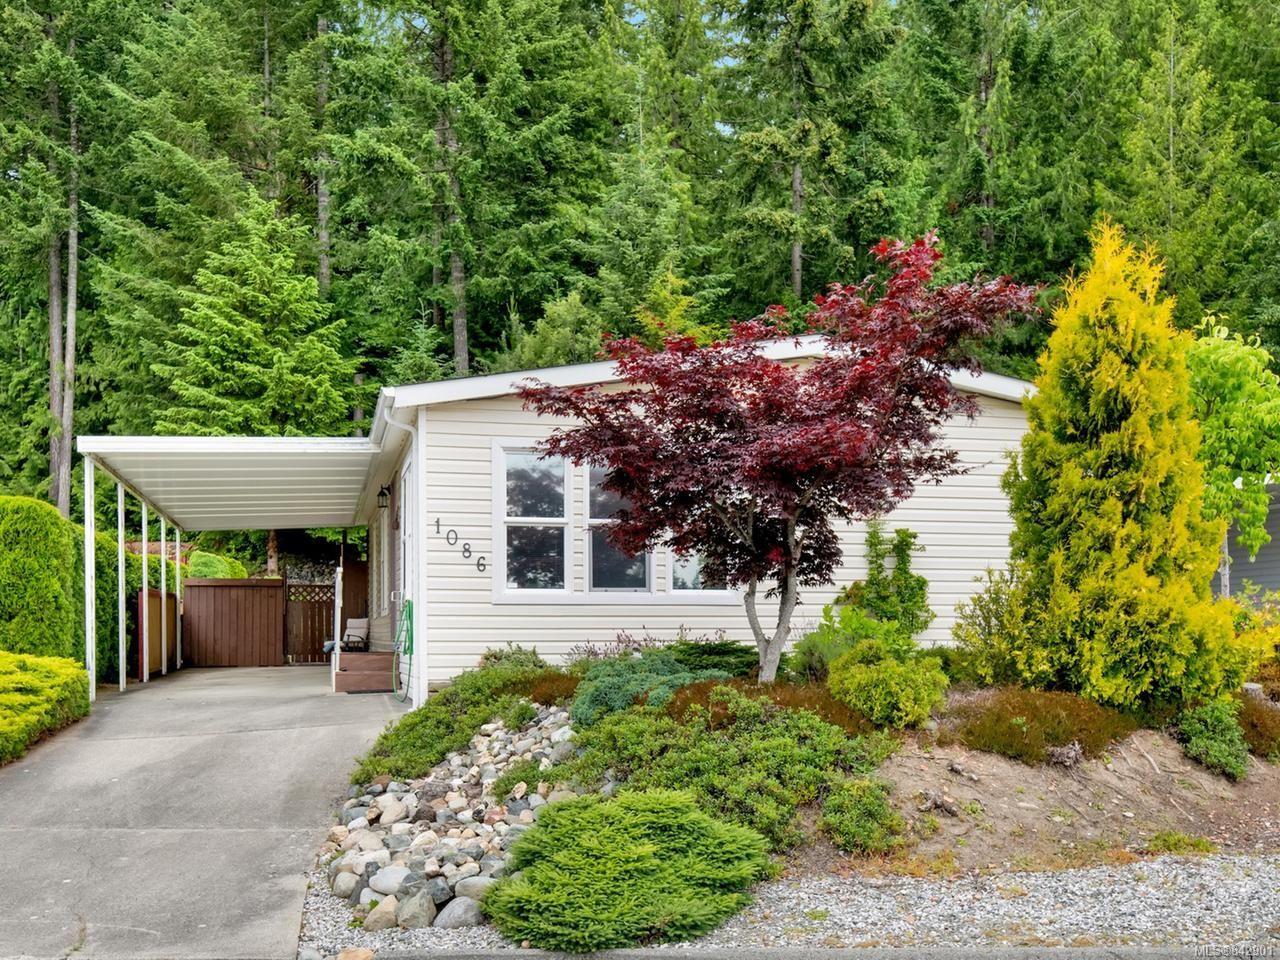 Main Photo: 1086 Morrell Cir in NANAIMO: Na South Nanaimo Manufactured Home for sale (Nanaimo)  : MLS®# 842901